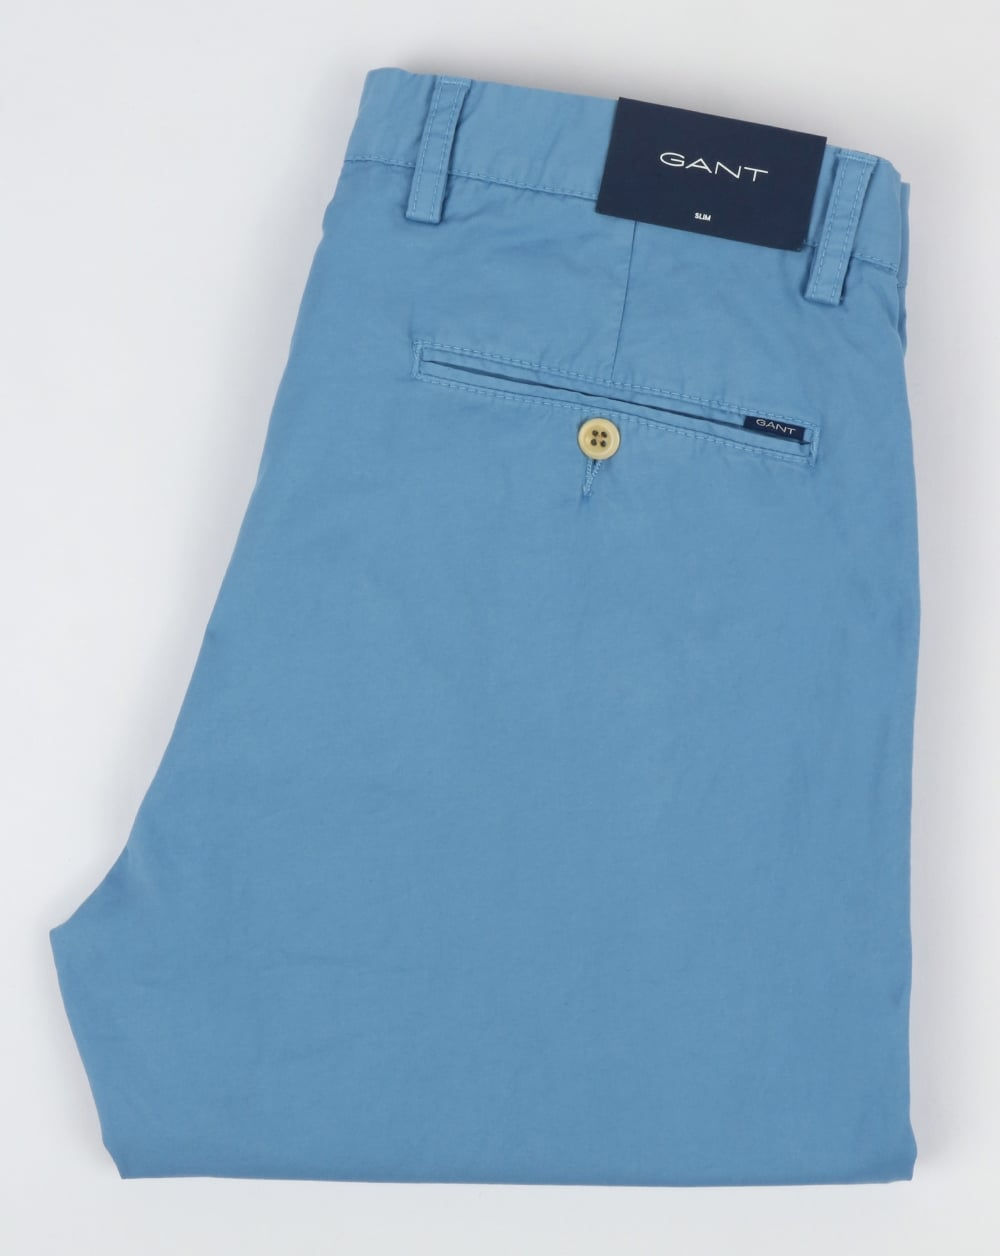 GANT Gant Slim Sunbleached Chino in Lava Blue